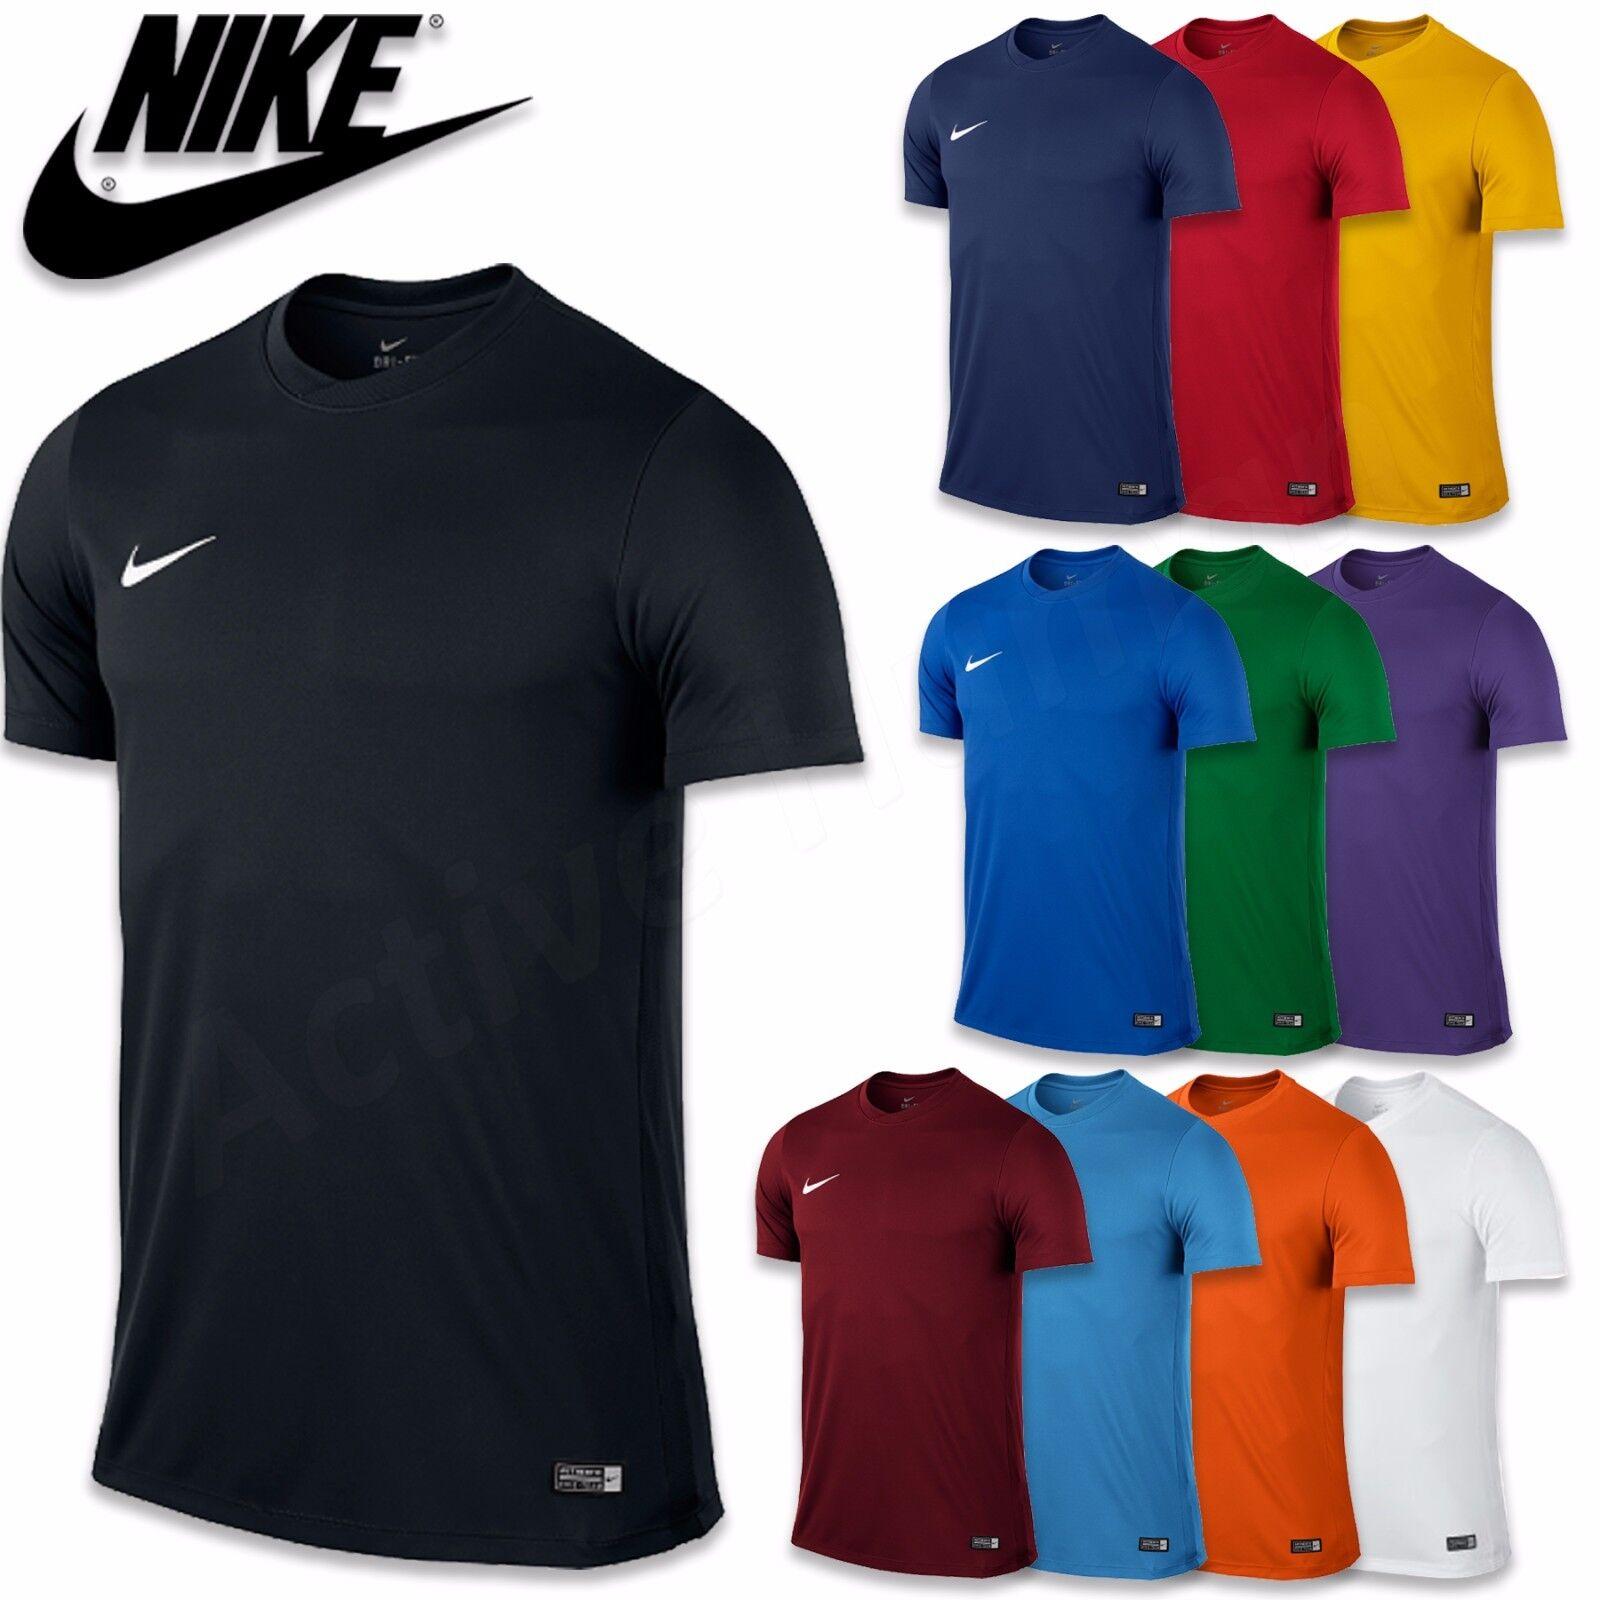 New Mens Nike Gym Sports Tee T-Shirt Top Size S M L XL XXL Black Navy Red Blue